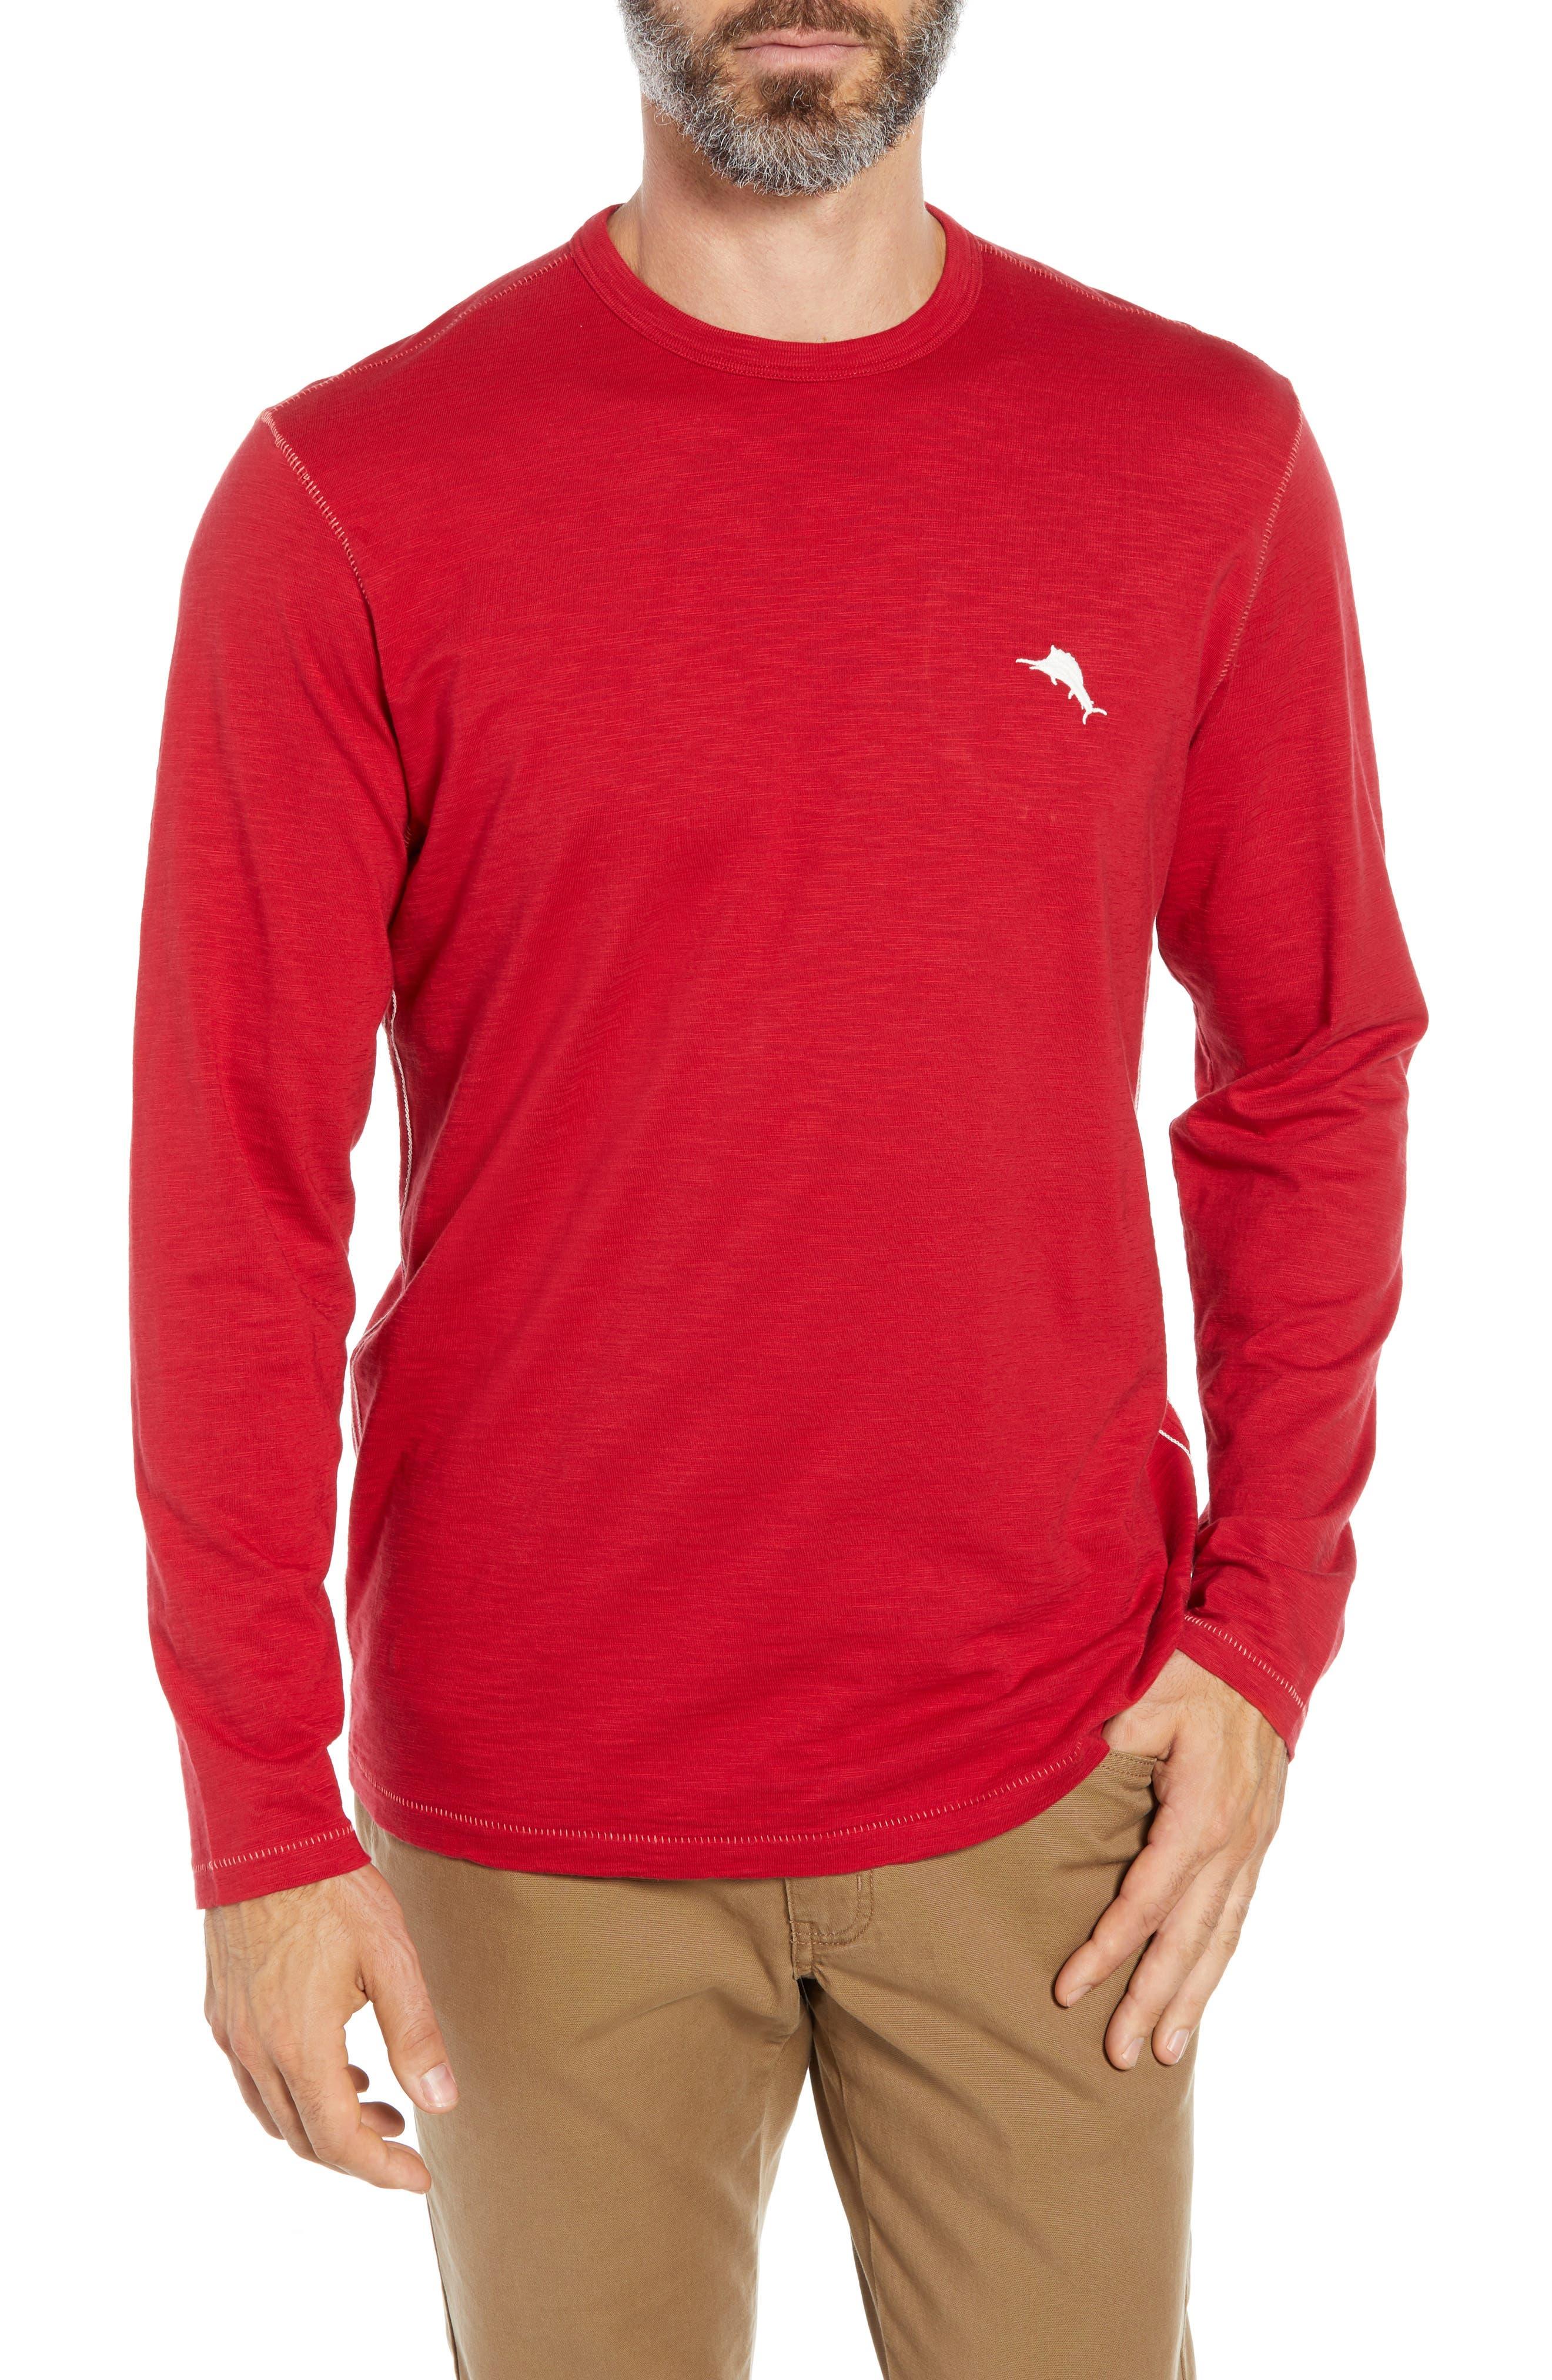 Mele Kalikimaka T-Shirt,                         Main,                         color, SCOOTER RED